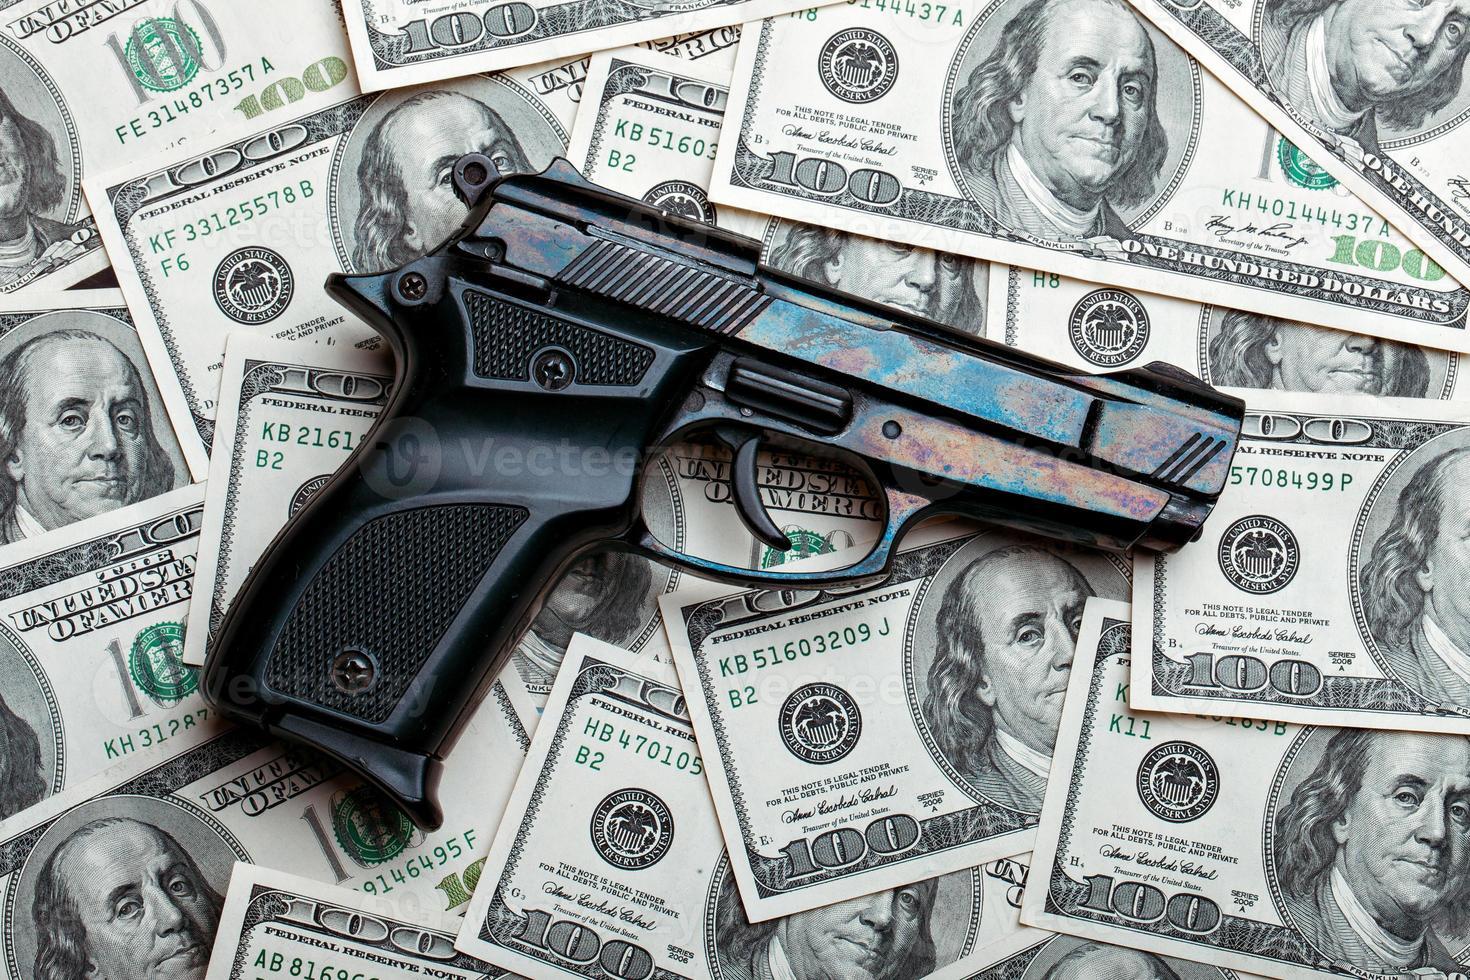 soldi e gun.dollars foto